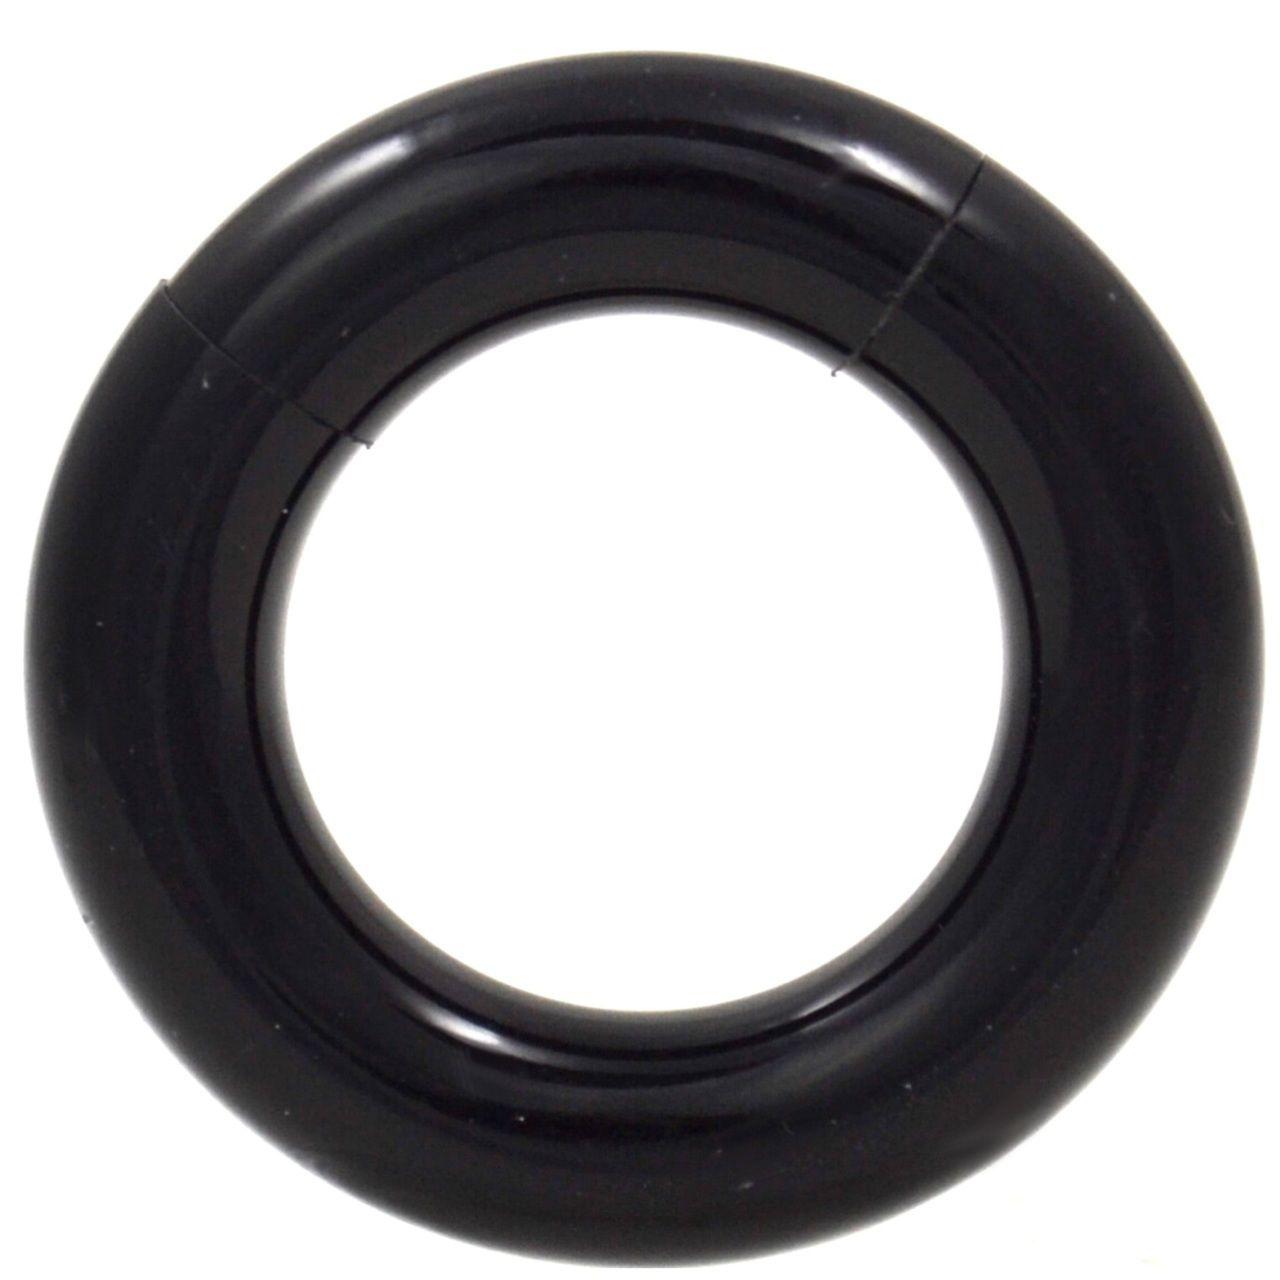 Pair All Black Acrylic Segment Ring Hoop 8g 0g Segment Rings Black Acrylics Black